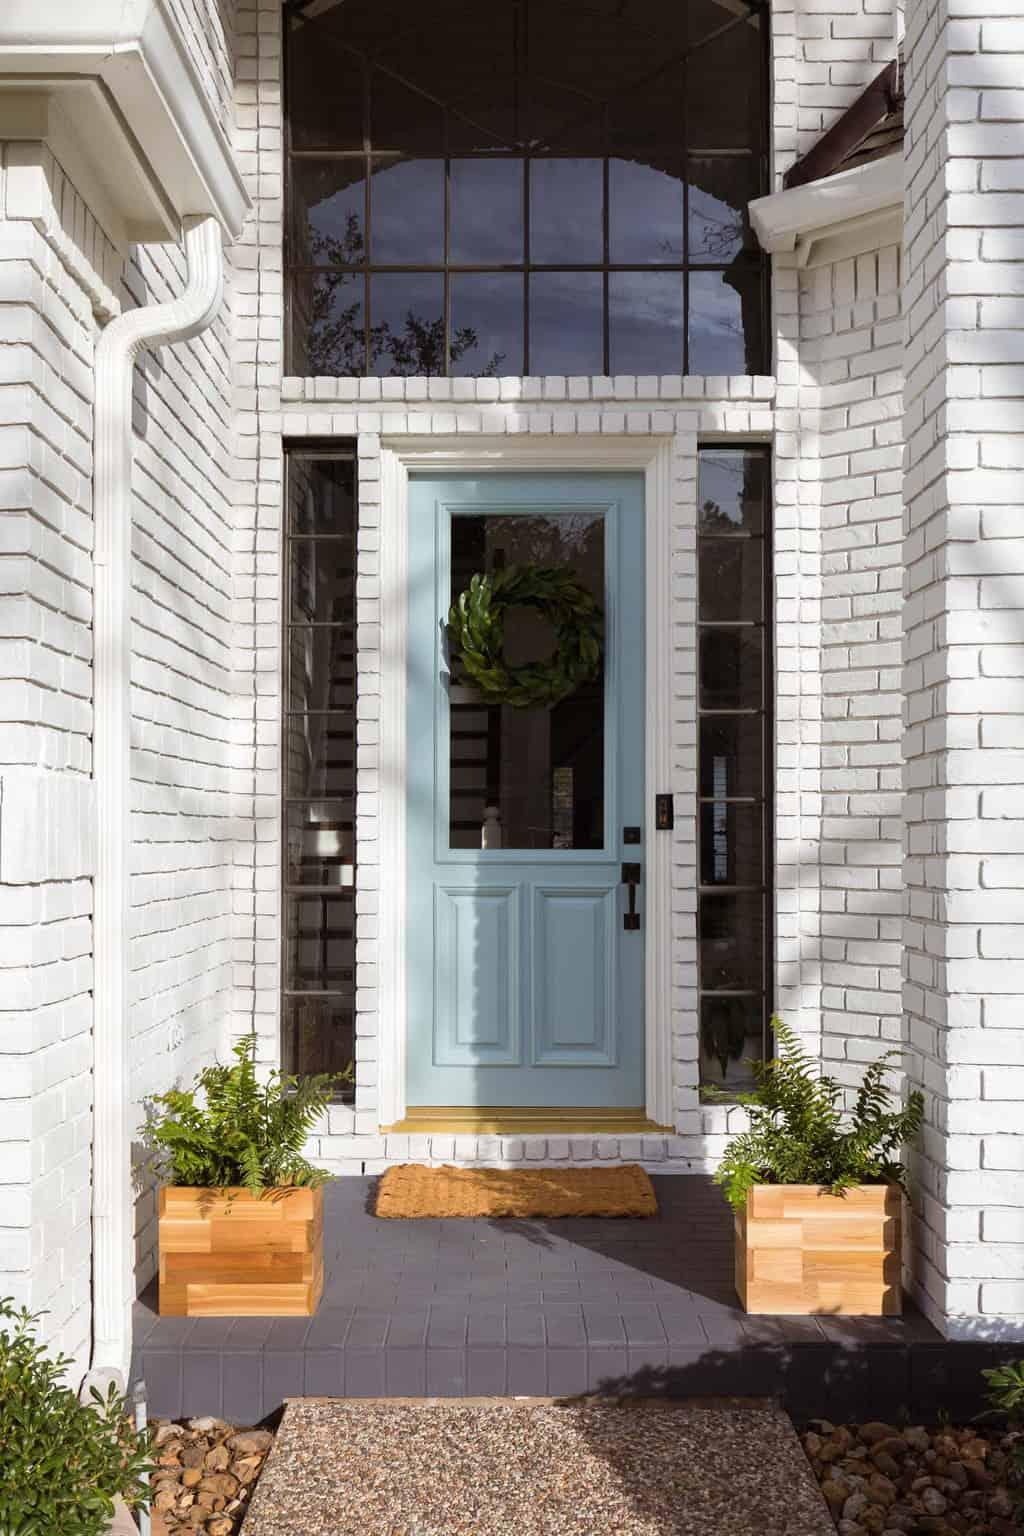 a limewash painted brick front porch and white brick exterior